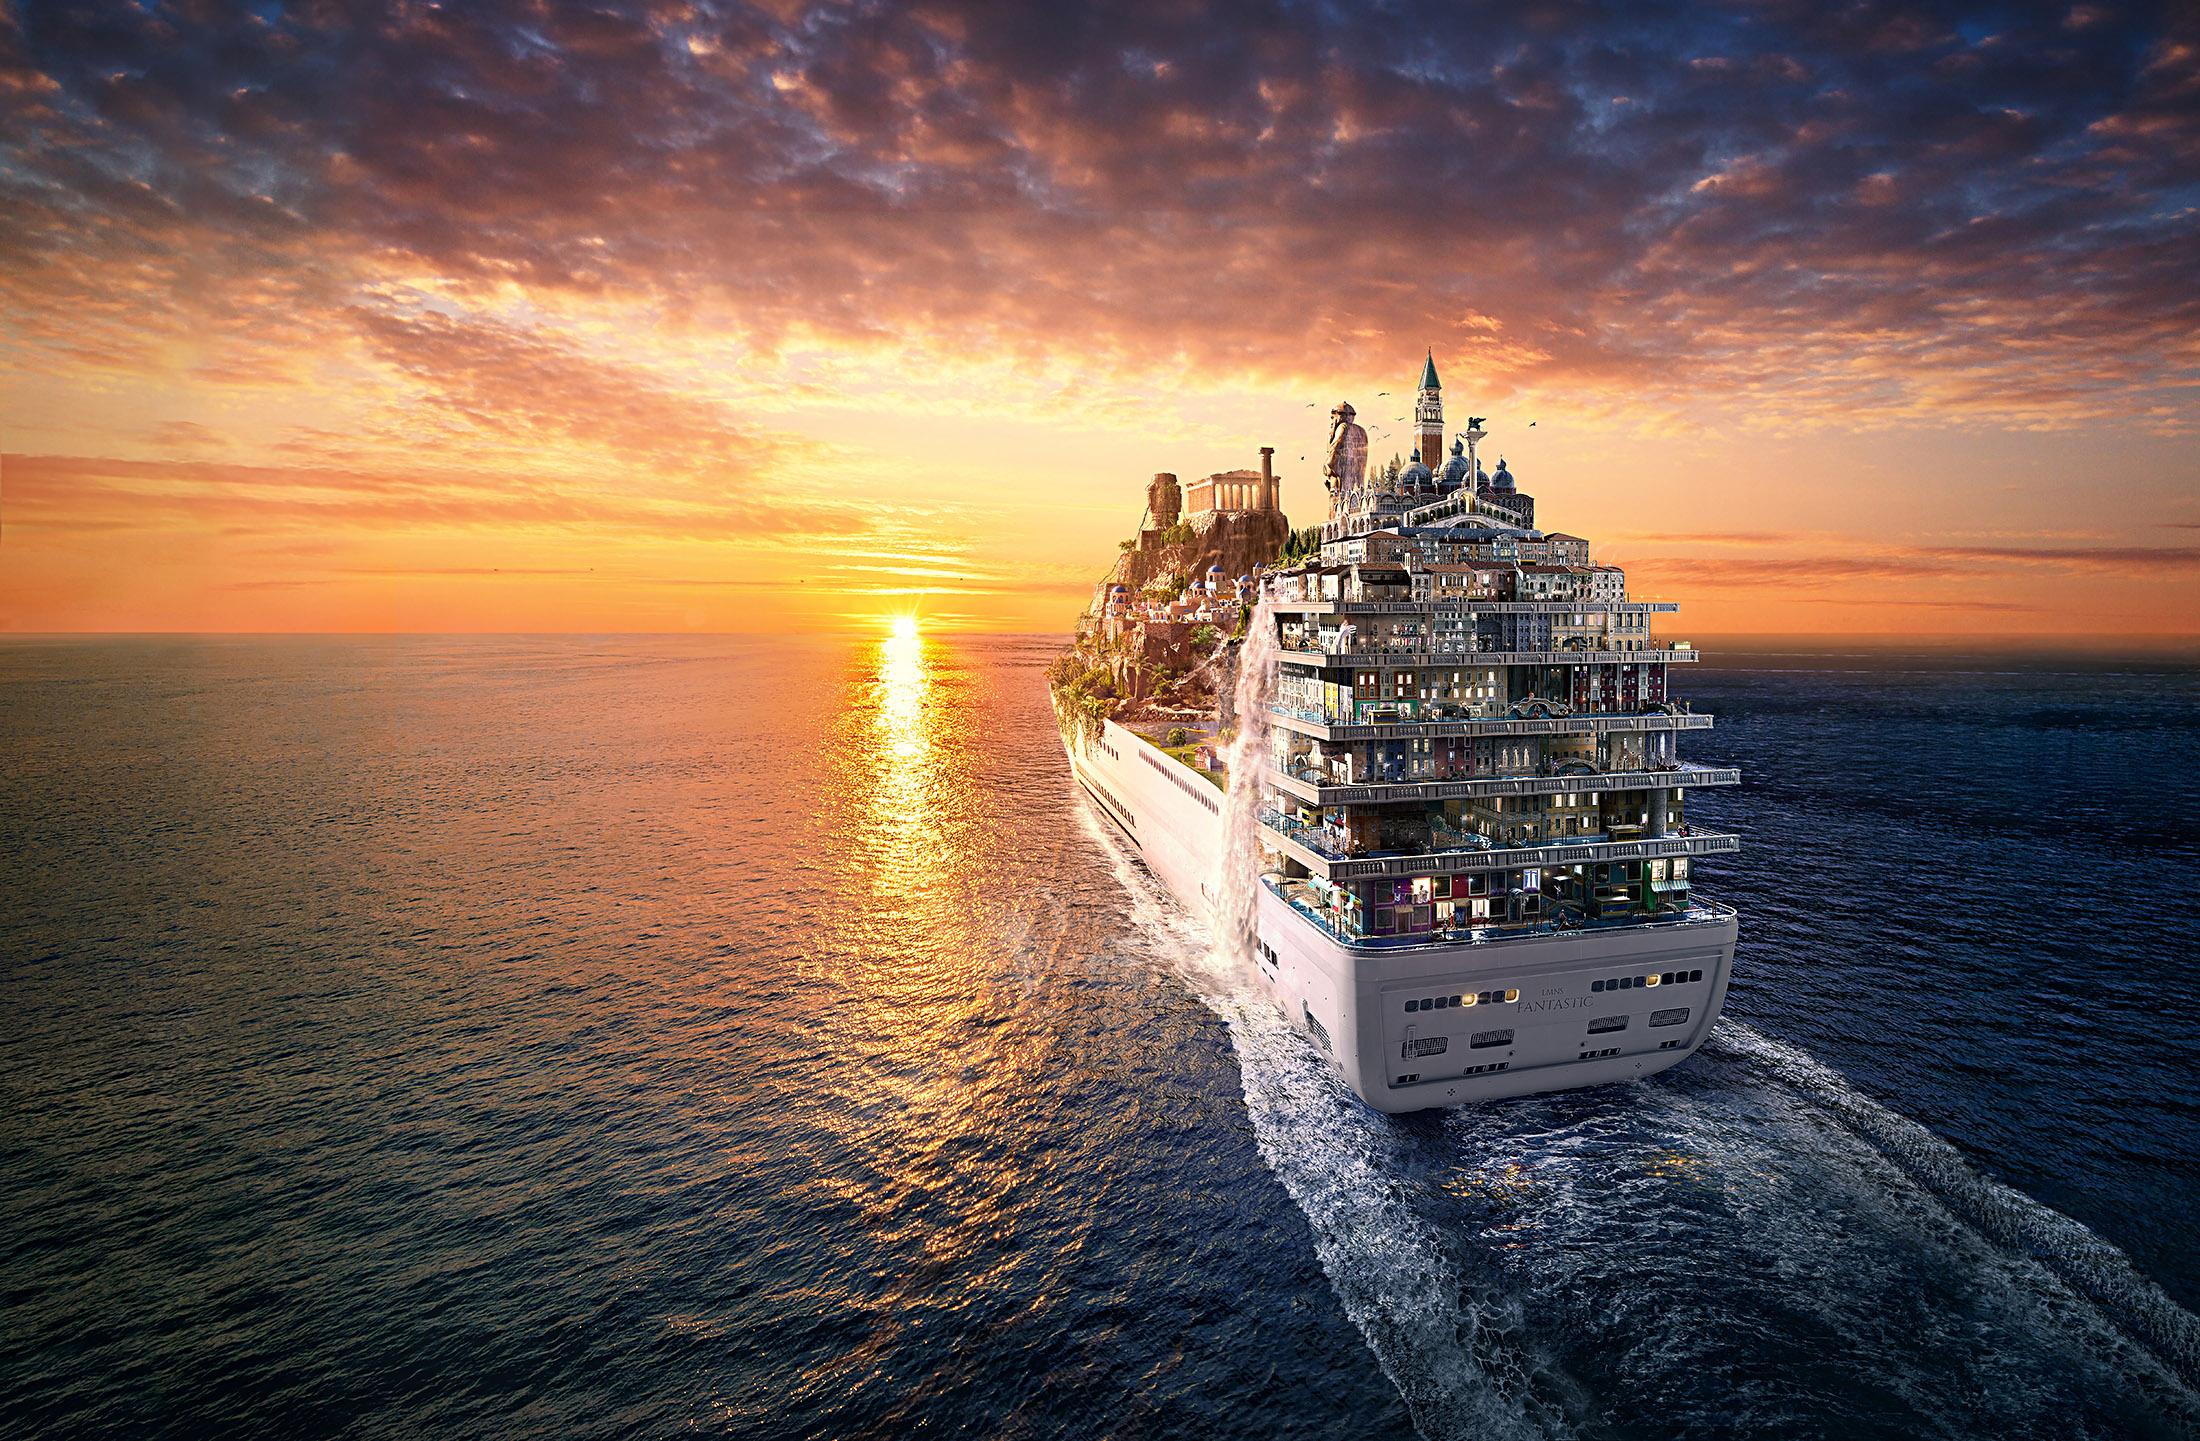 Lamano Studio - Fantastic Cruise Sunset